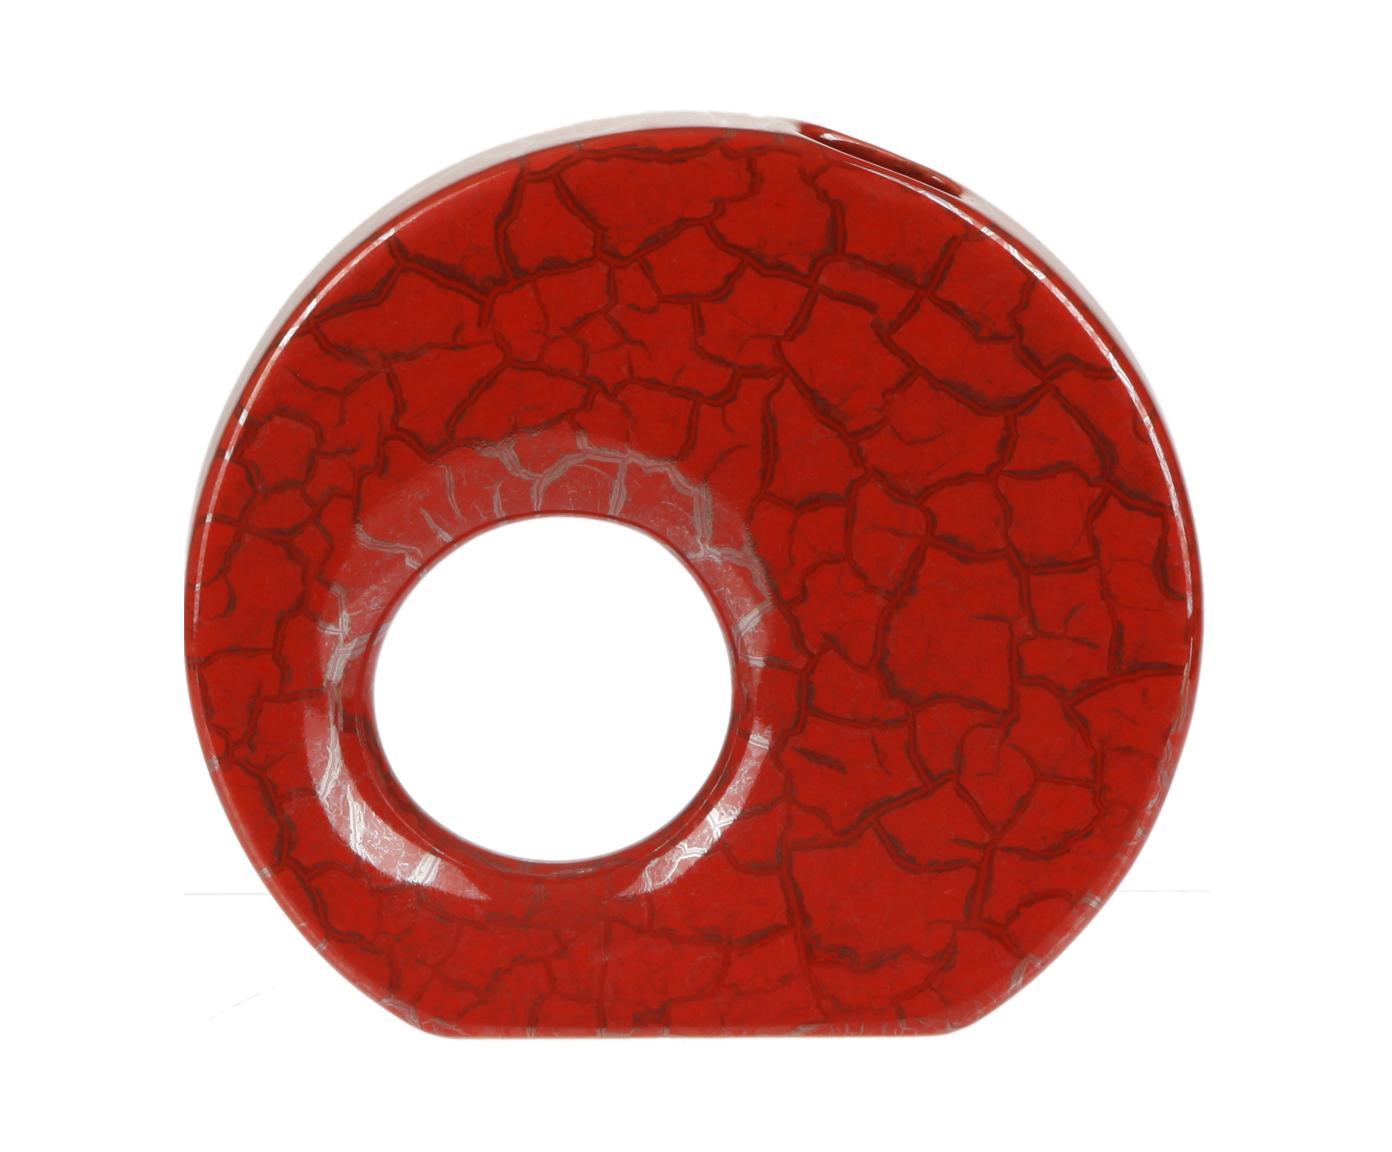 Вазы настольные Элитная ваза декоративная Red Passion круглая большая от Sporvil elitnaya-vaza-dekorativnaya-red-passion-kruglaya-ot-sporvil-portugaliya.jpg